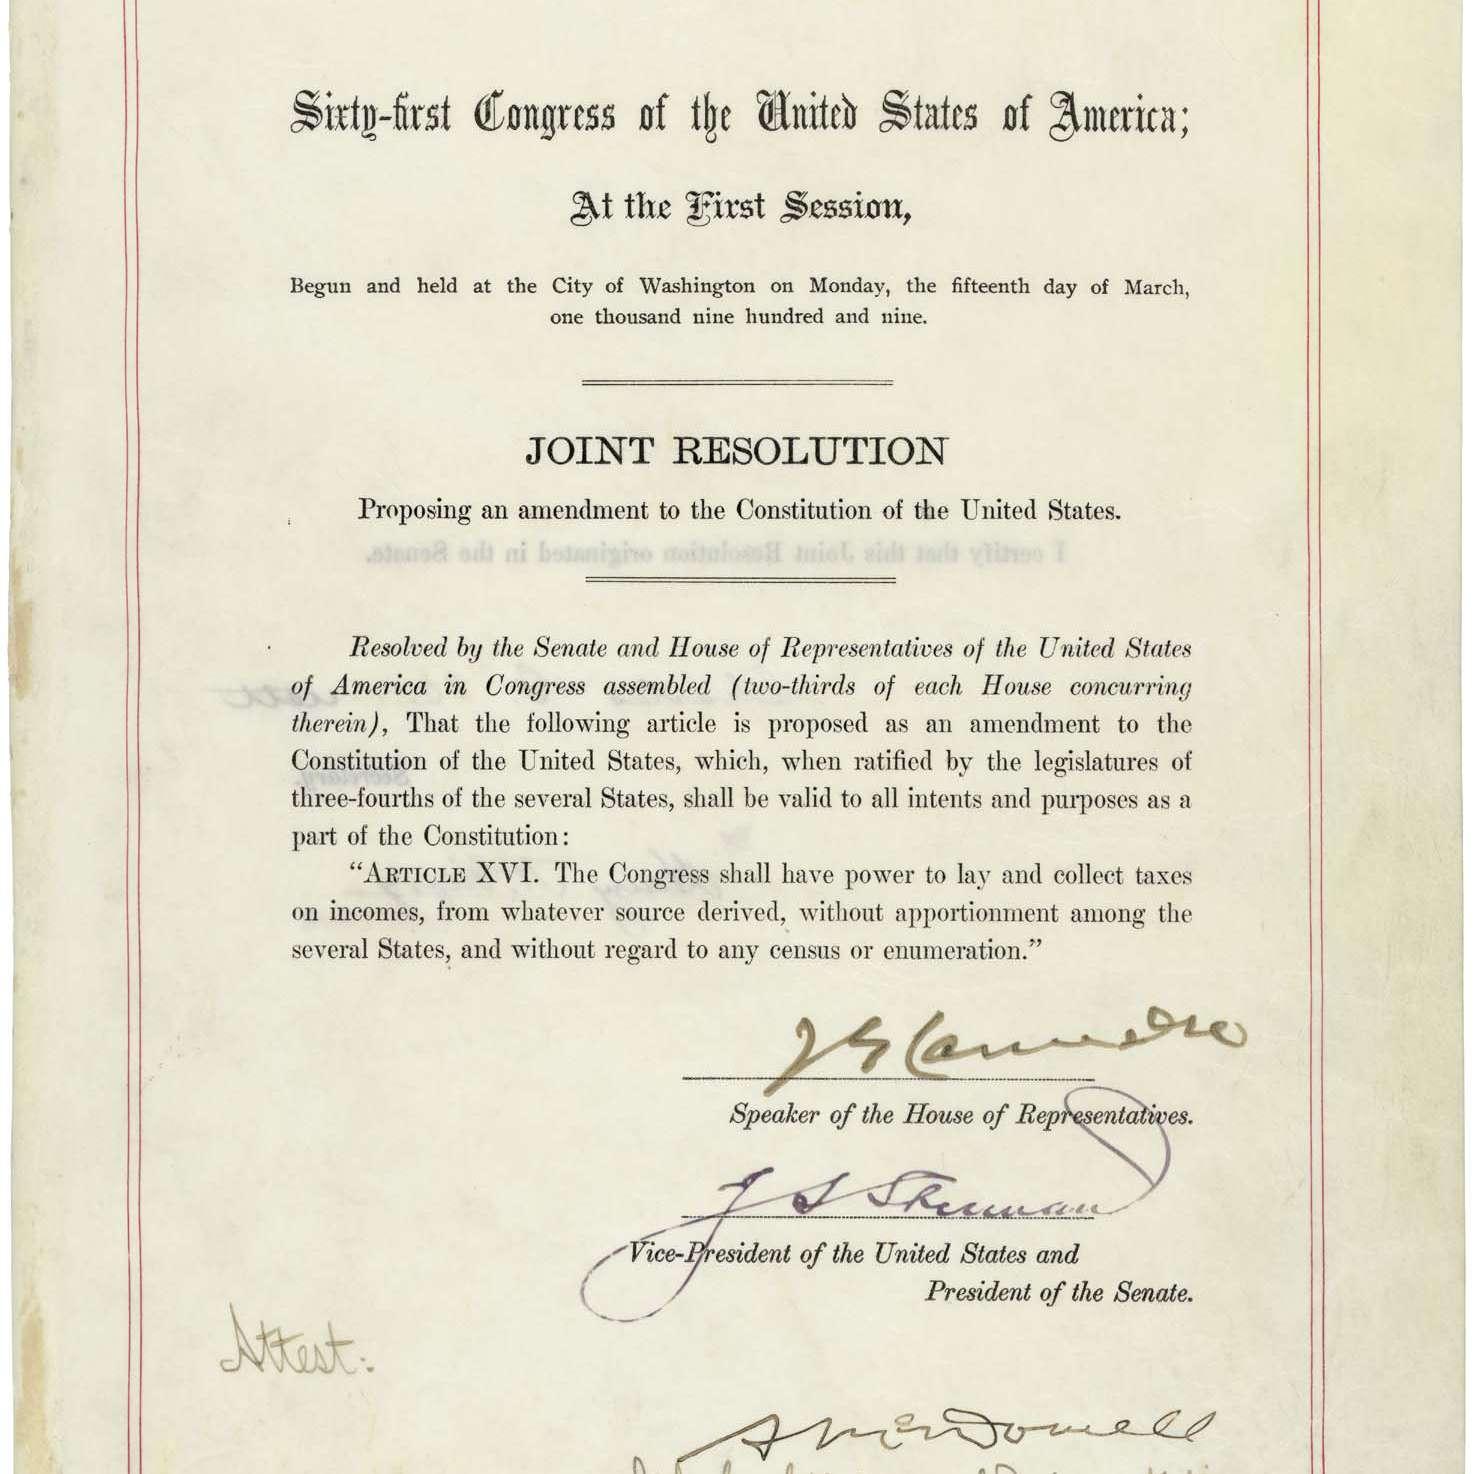 The 16th Amendment Establishing Federal Income Tax